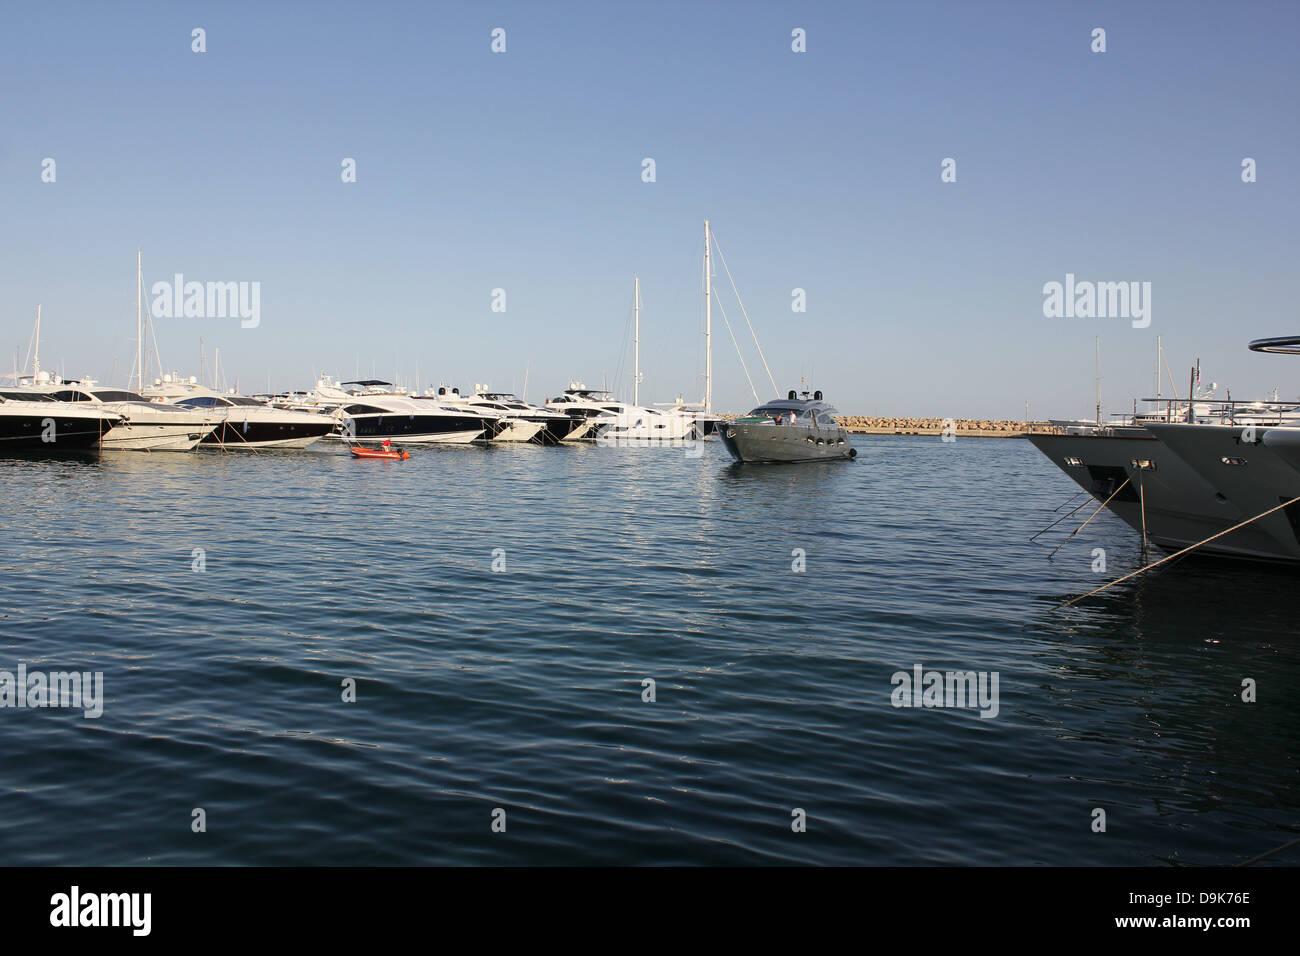 Luxury motor superyacht returning to berth in Puerto Portals marina, Calvia, South West Mallorca / Majorca, Balearic - Stock Image